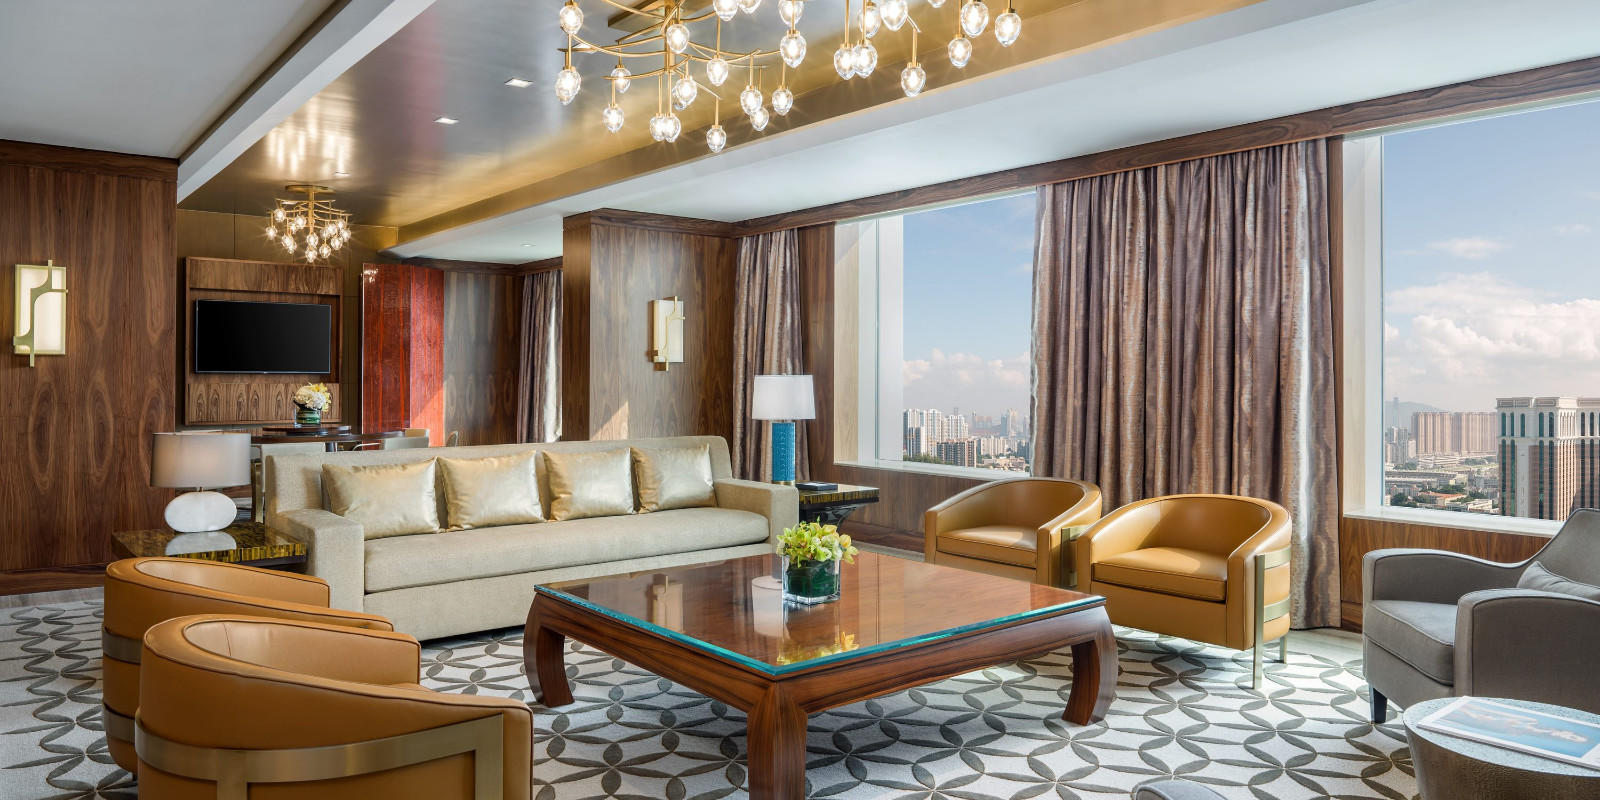 YSK Furniture hot-sale clubhouse furniture custom made for hotel